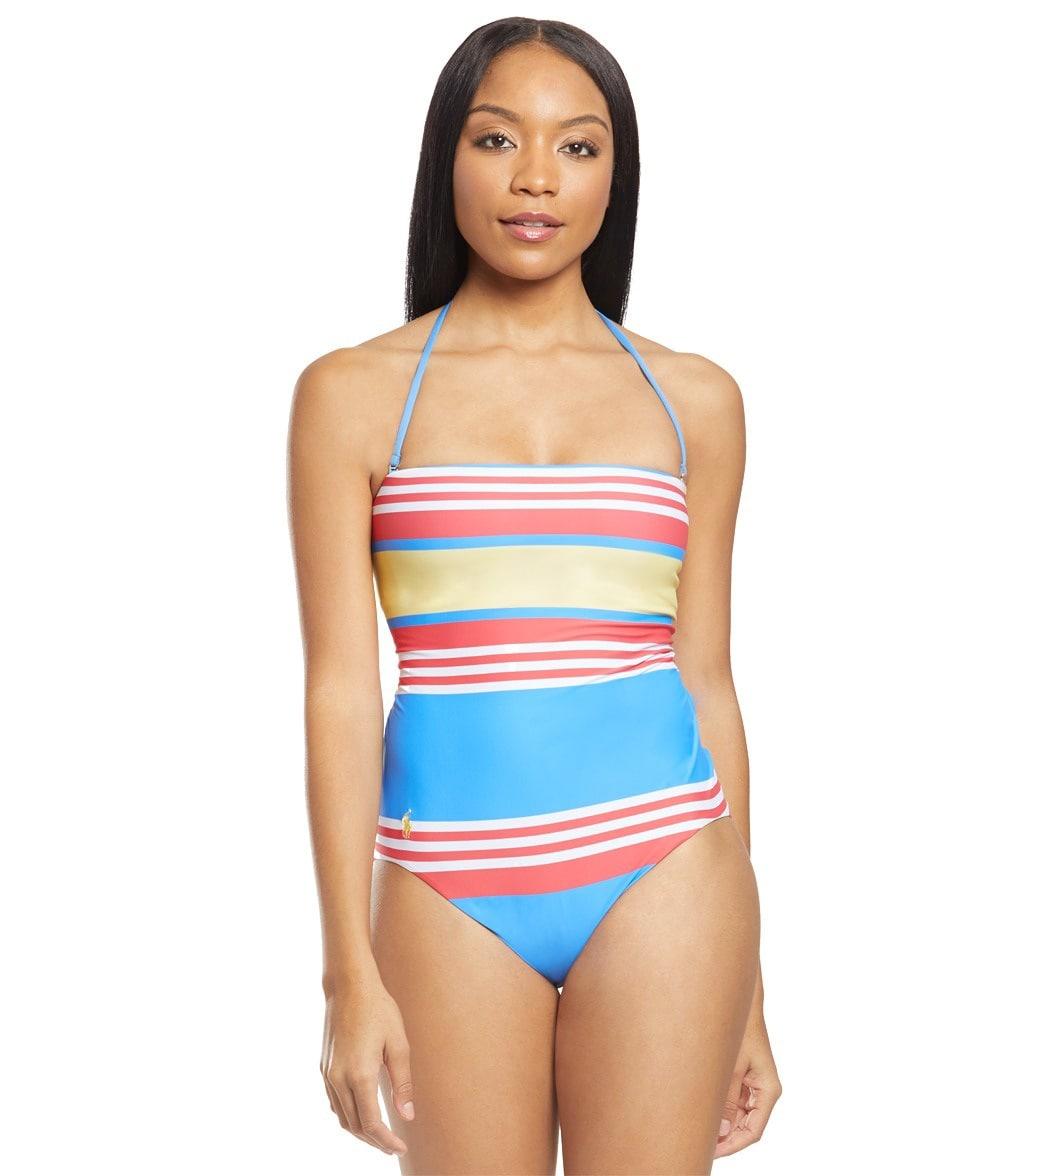 ce050ddd Polo Ralph Lauren Engineered Stripes Bandeau Strap One Piece Swimsuit